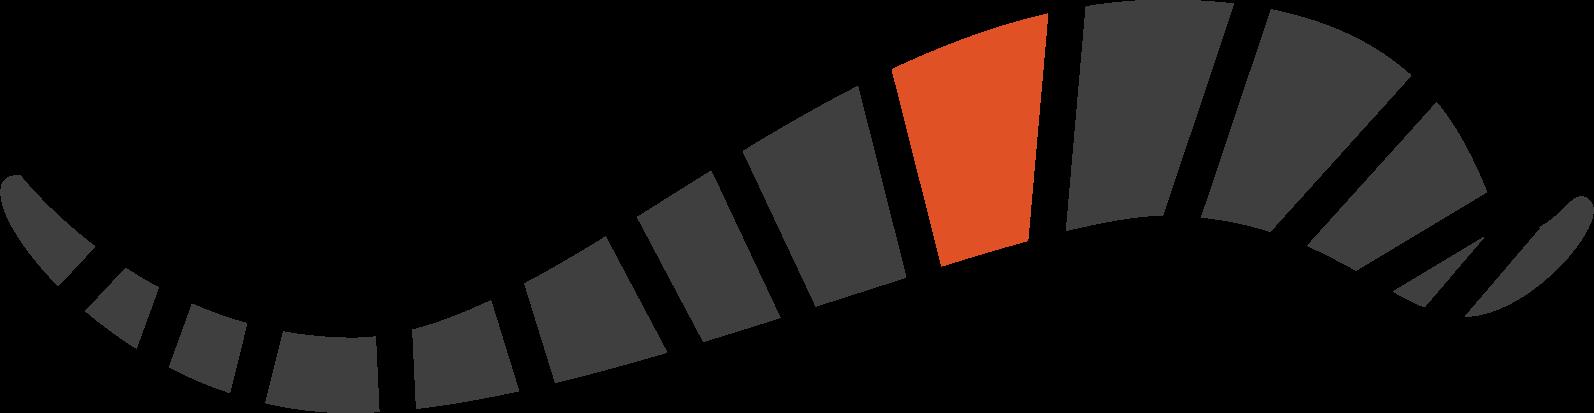 watermark logo